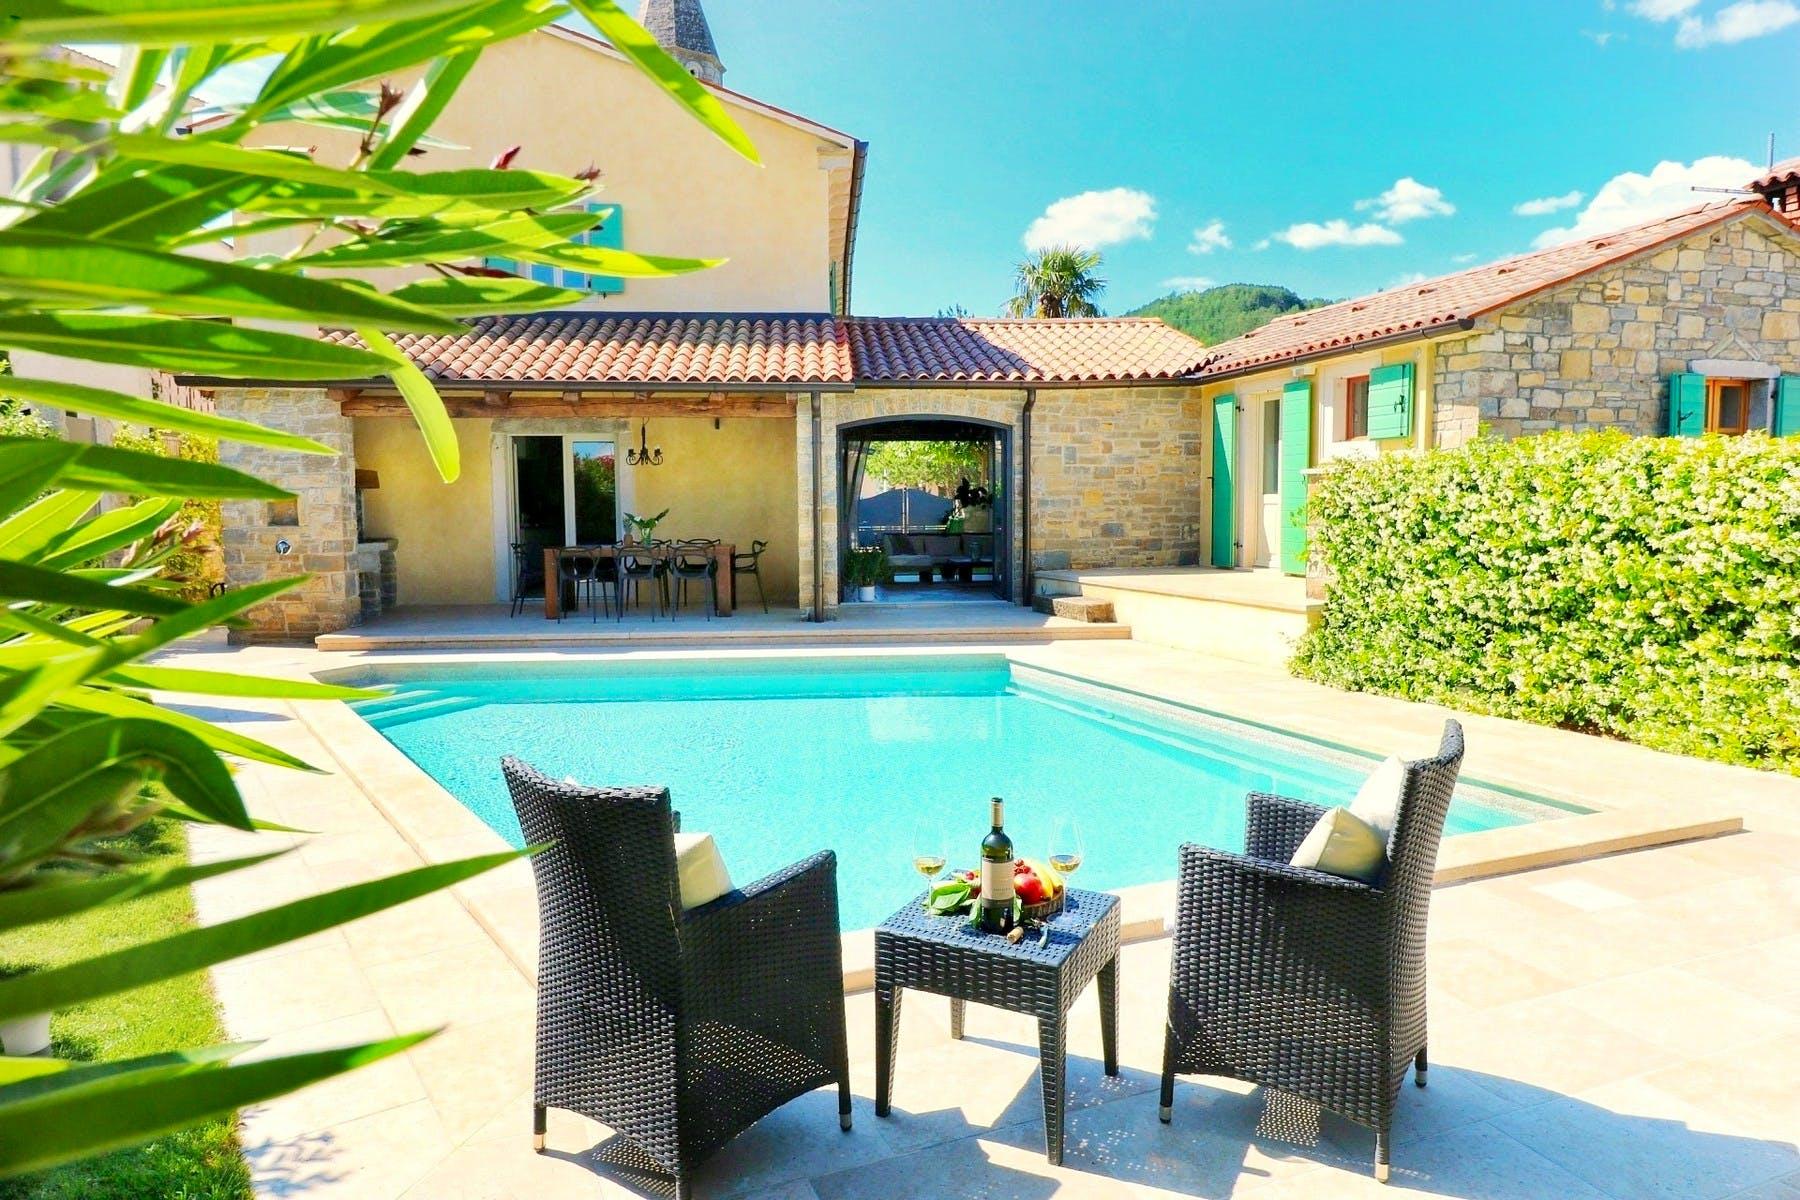 Heated swimming pool with sunbathing area